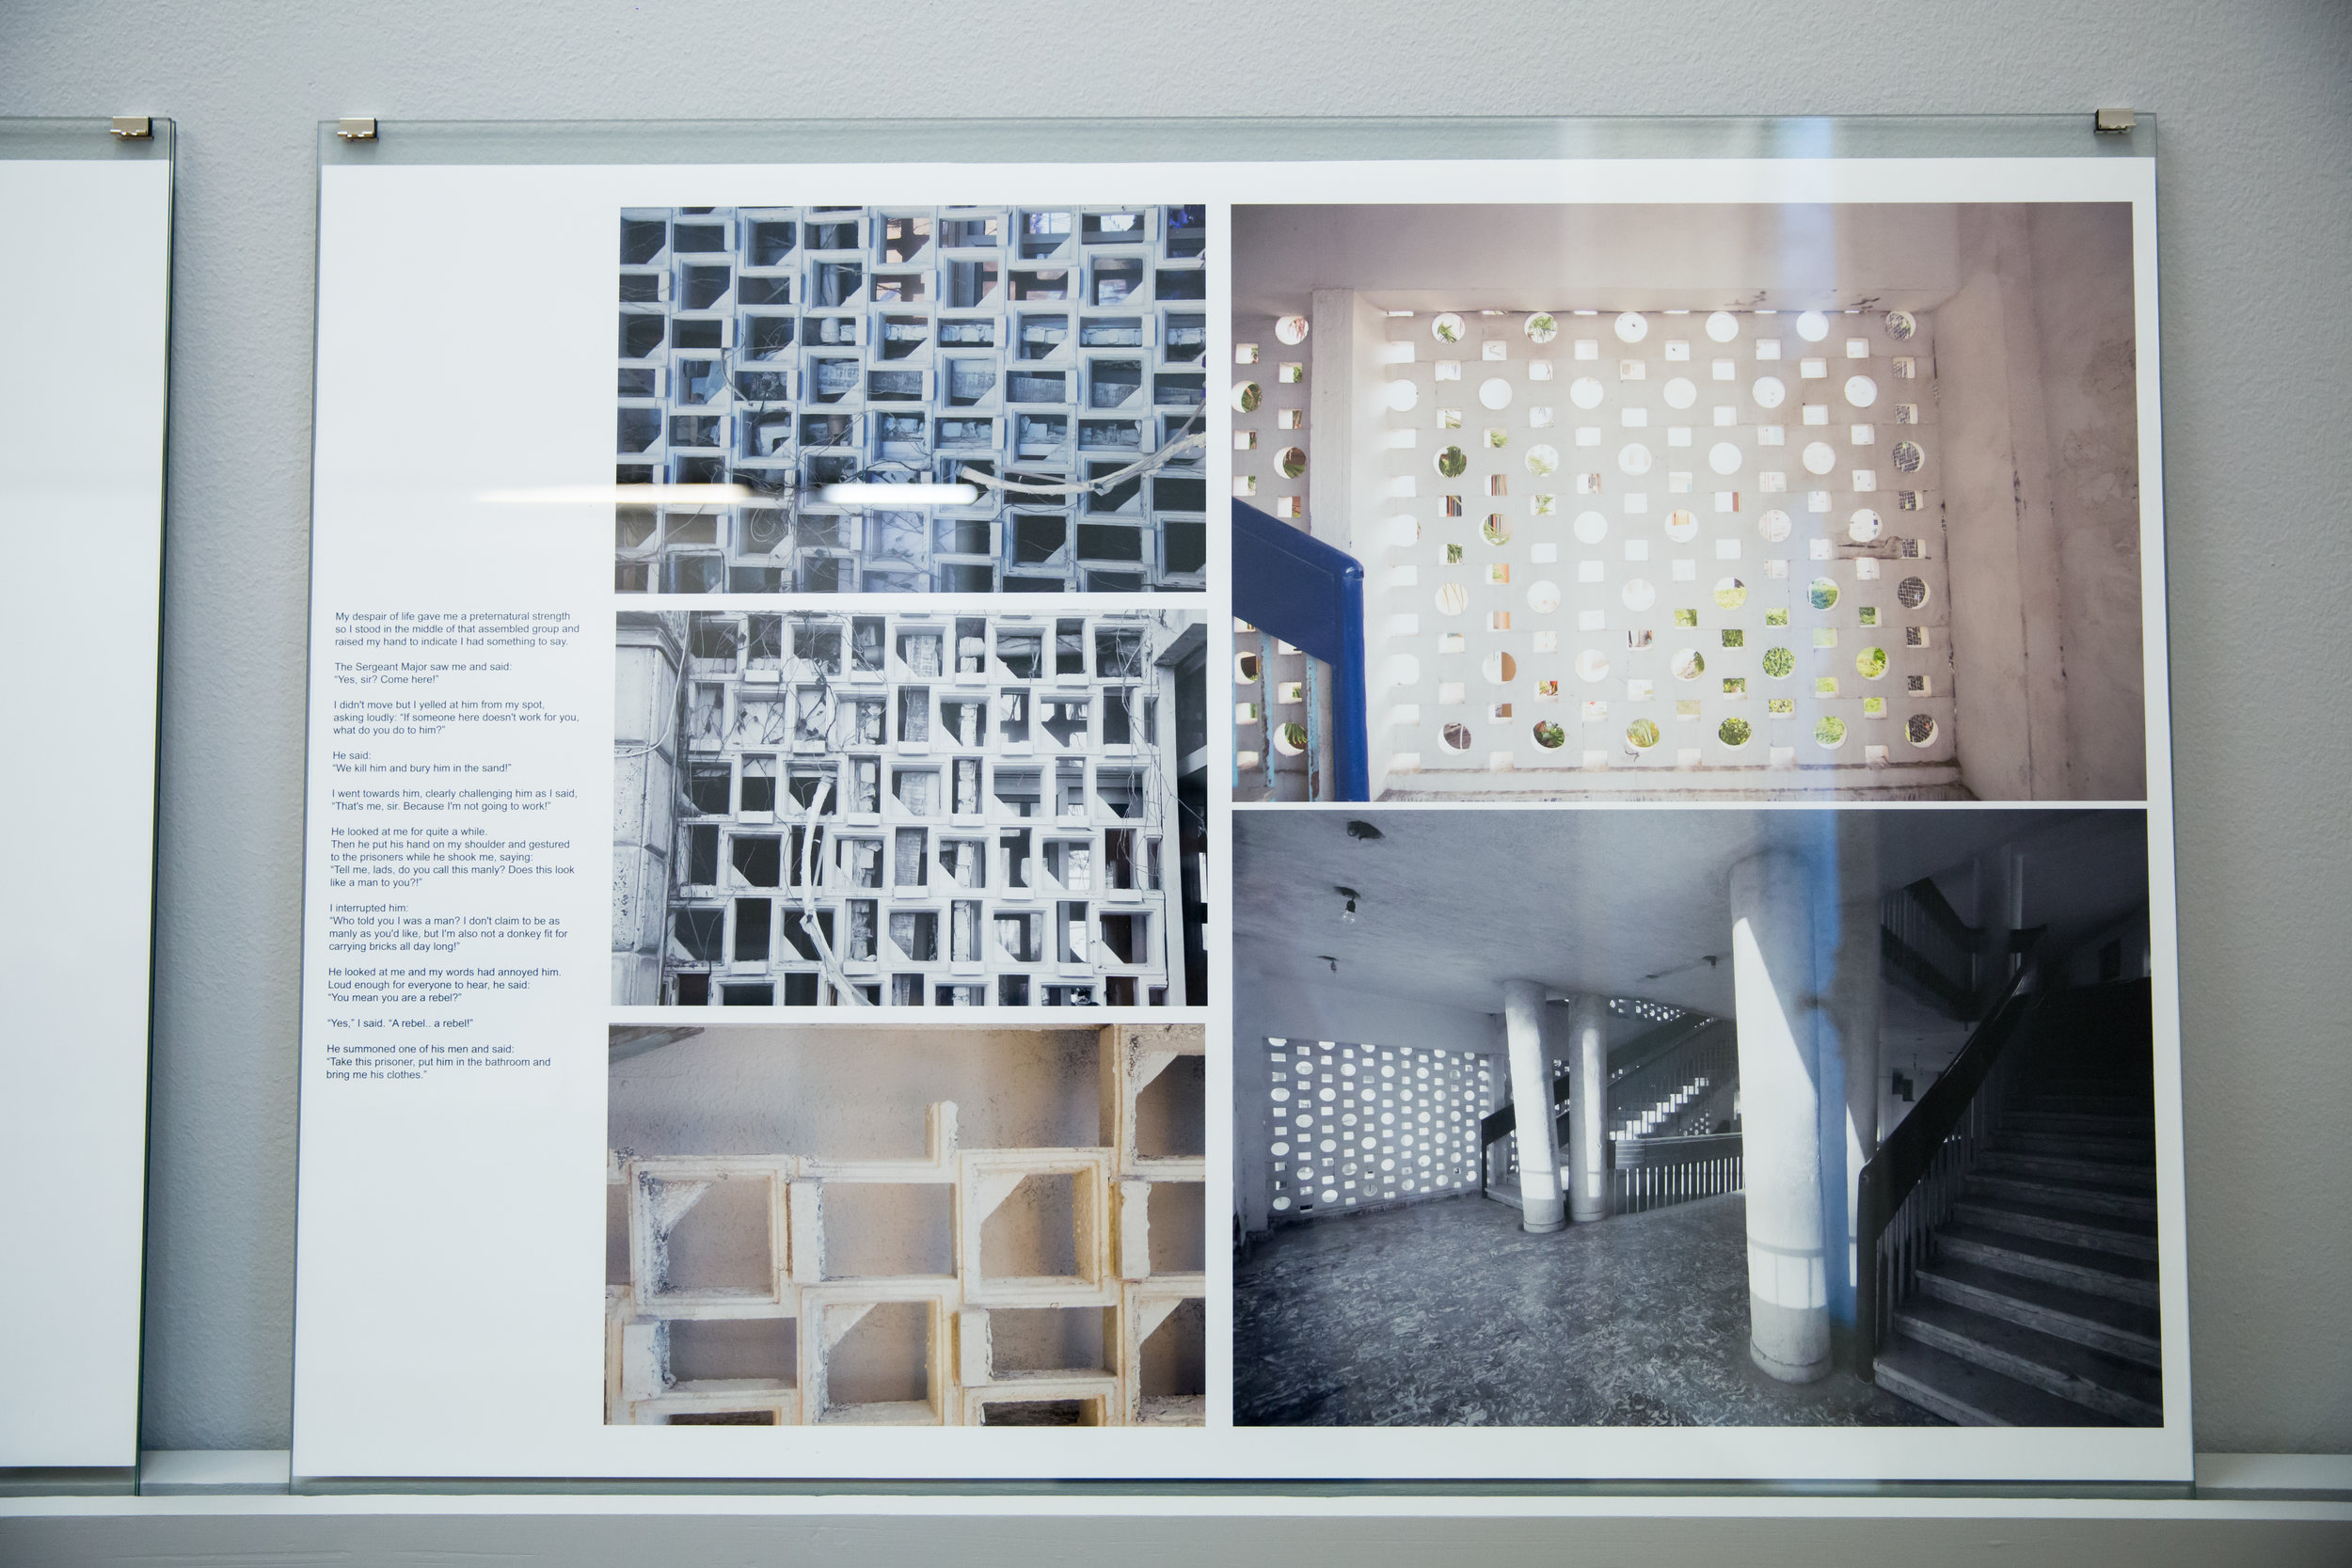 Gypsum-Gallery_Mahmoud-Khaled_Exhibition_ (54).jpg